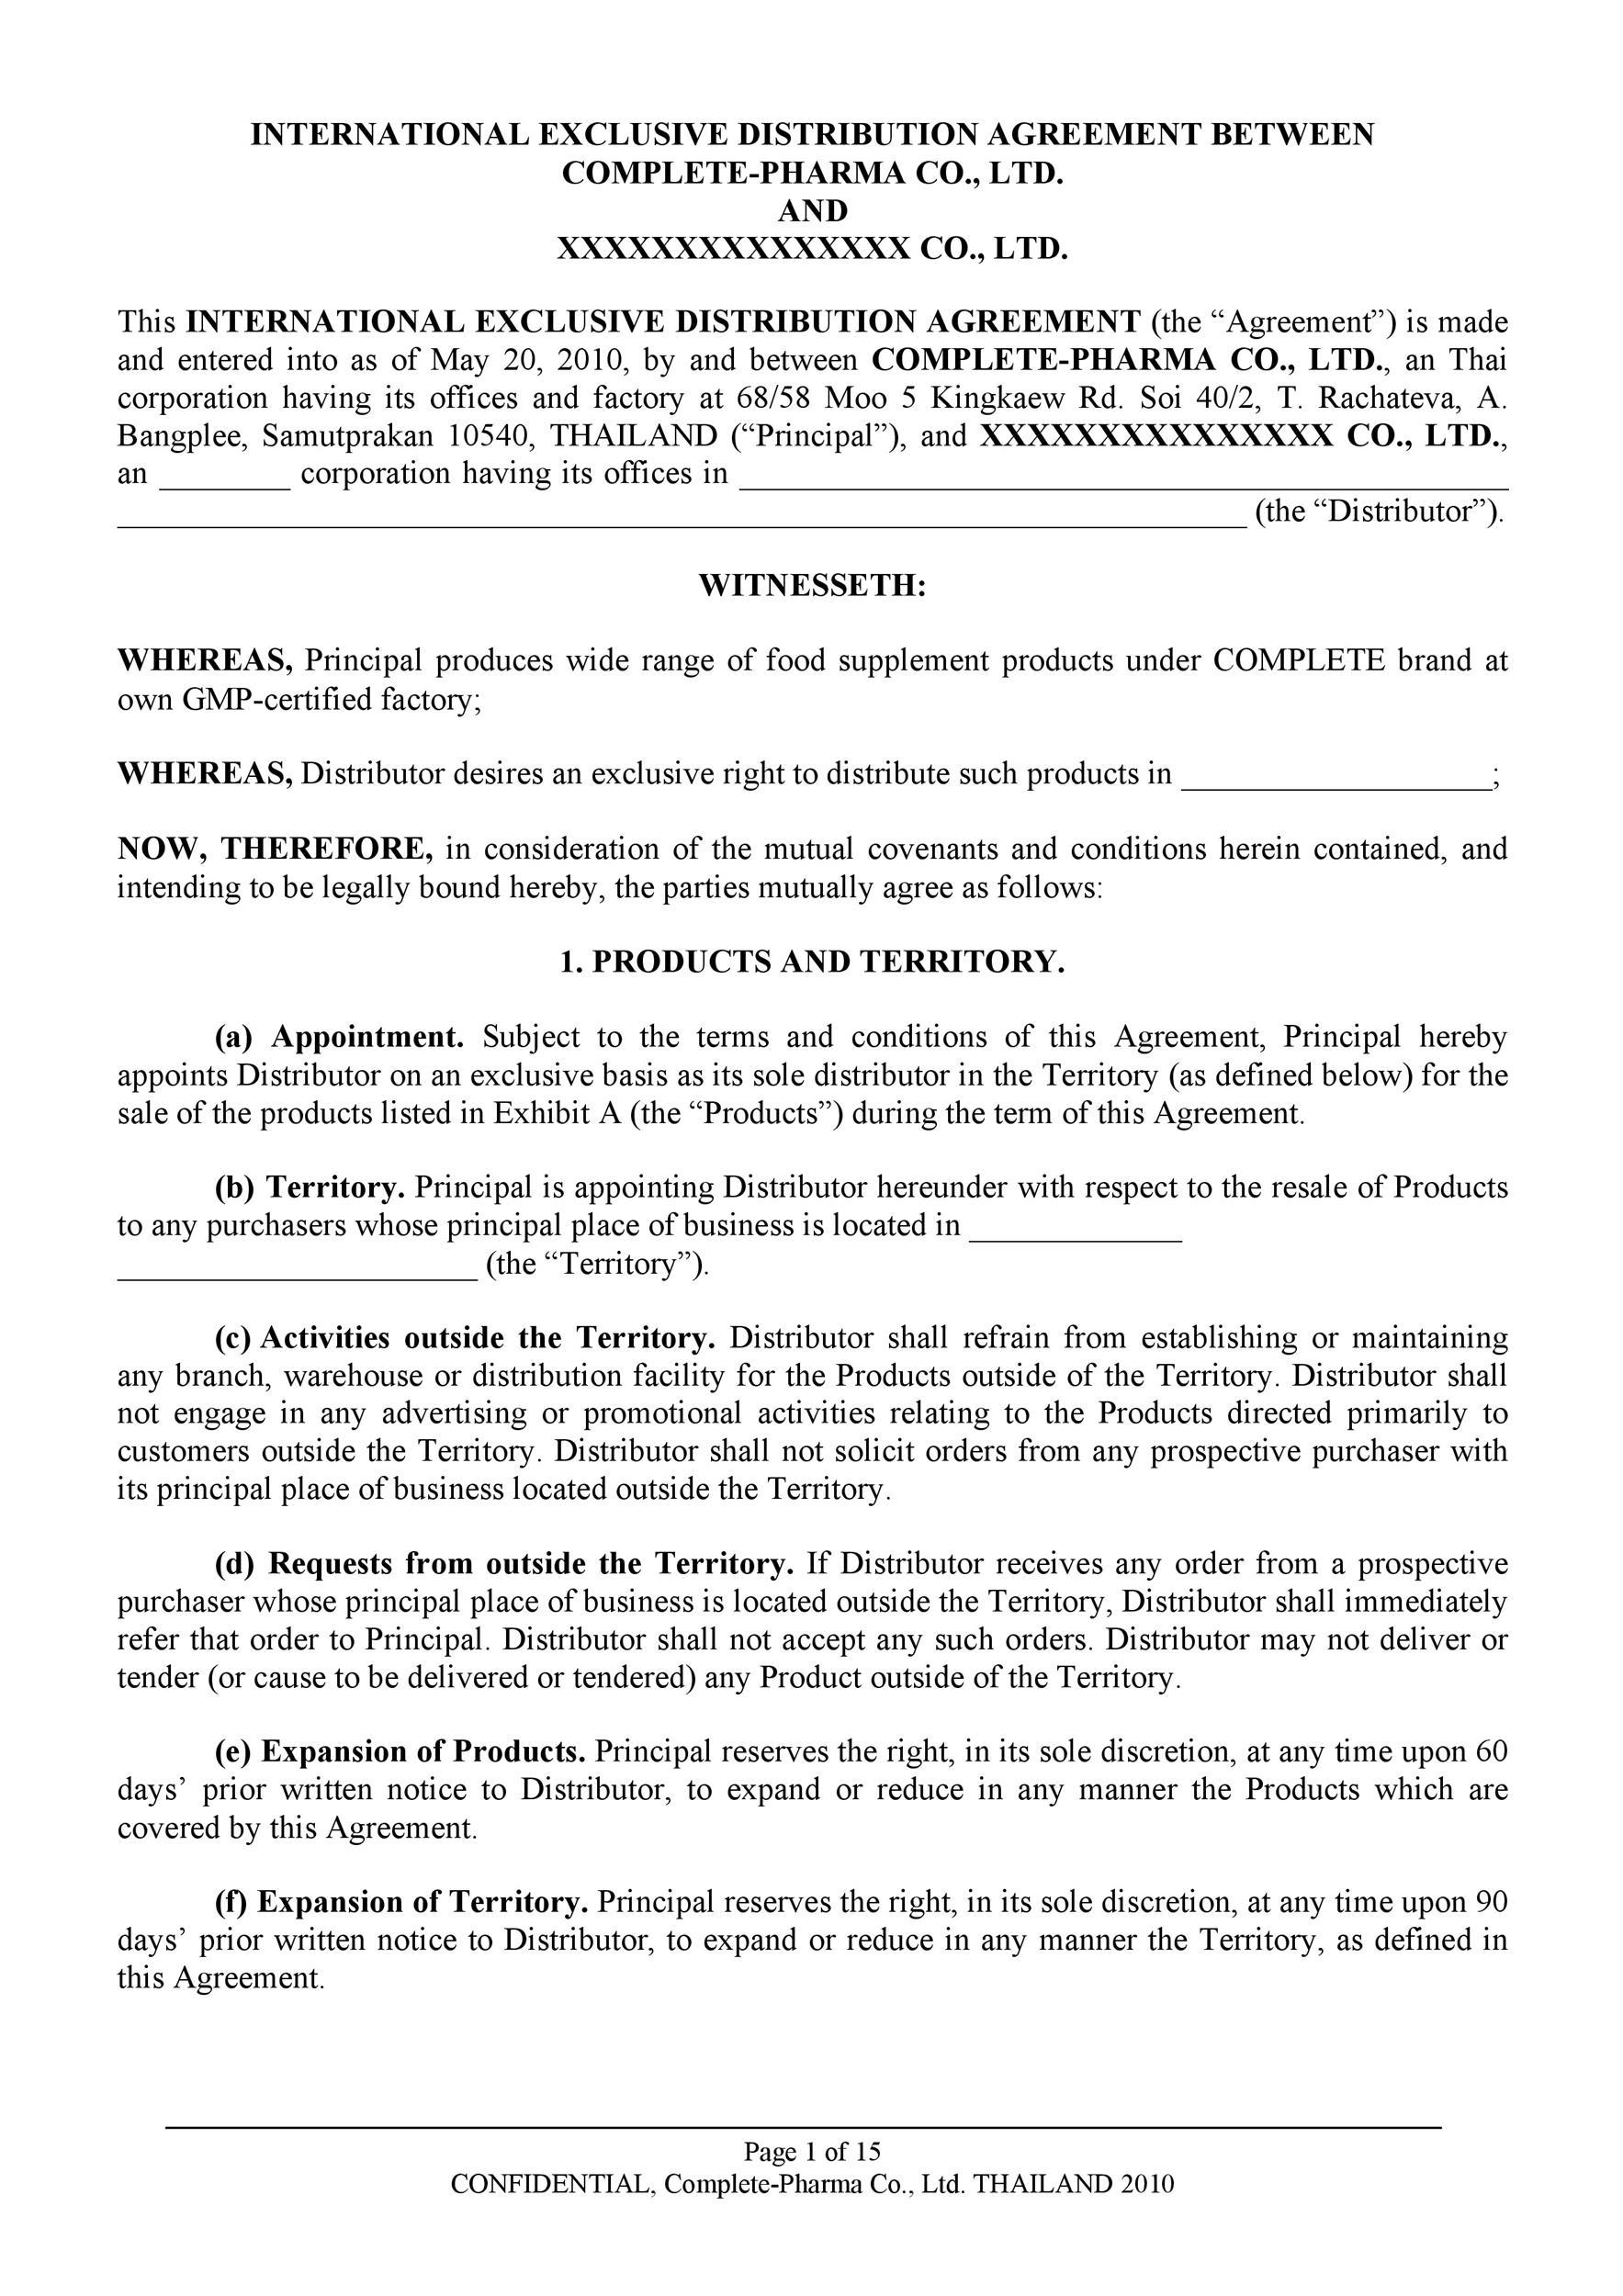 Free distribution agreement 20